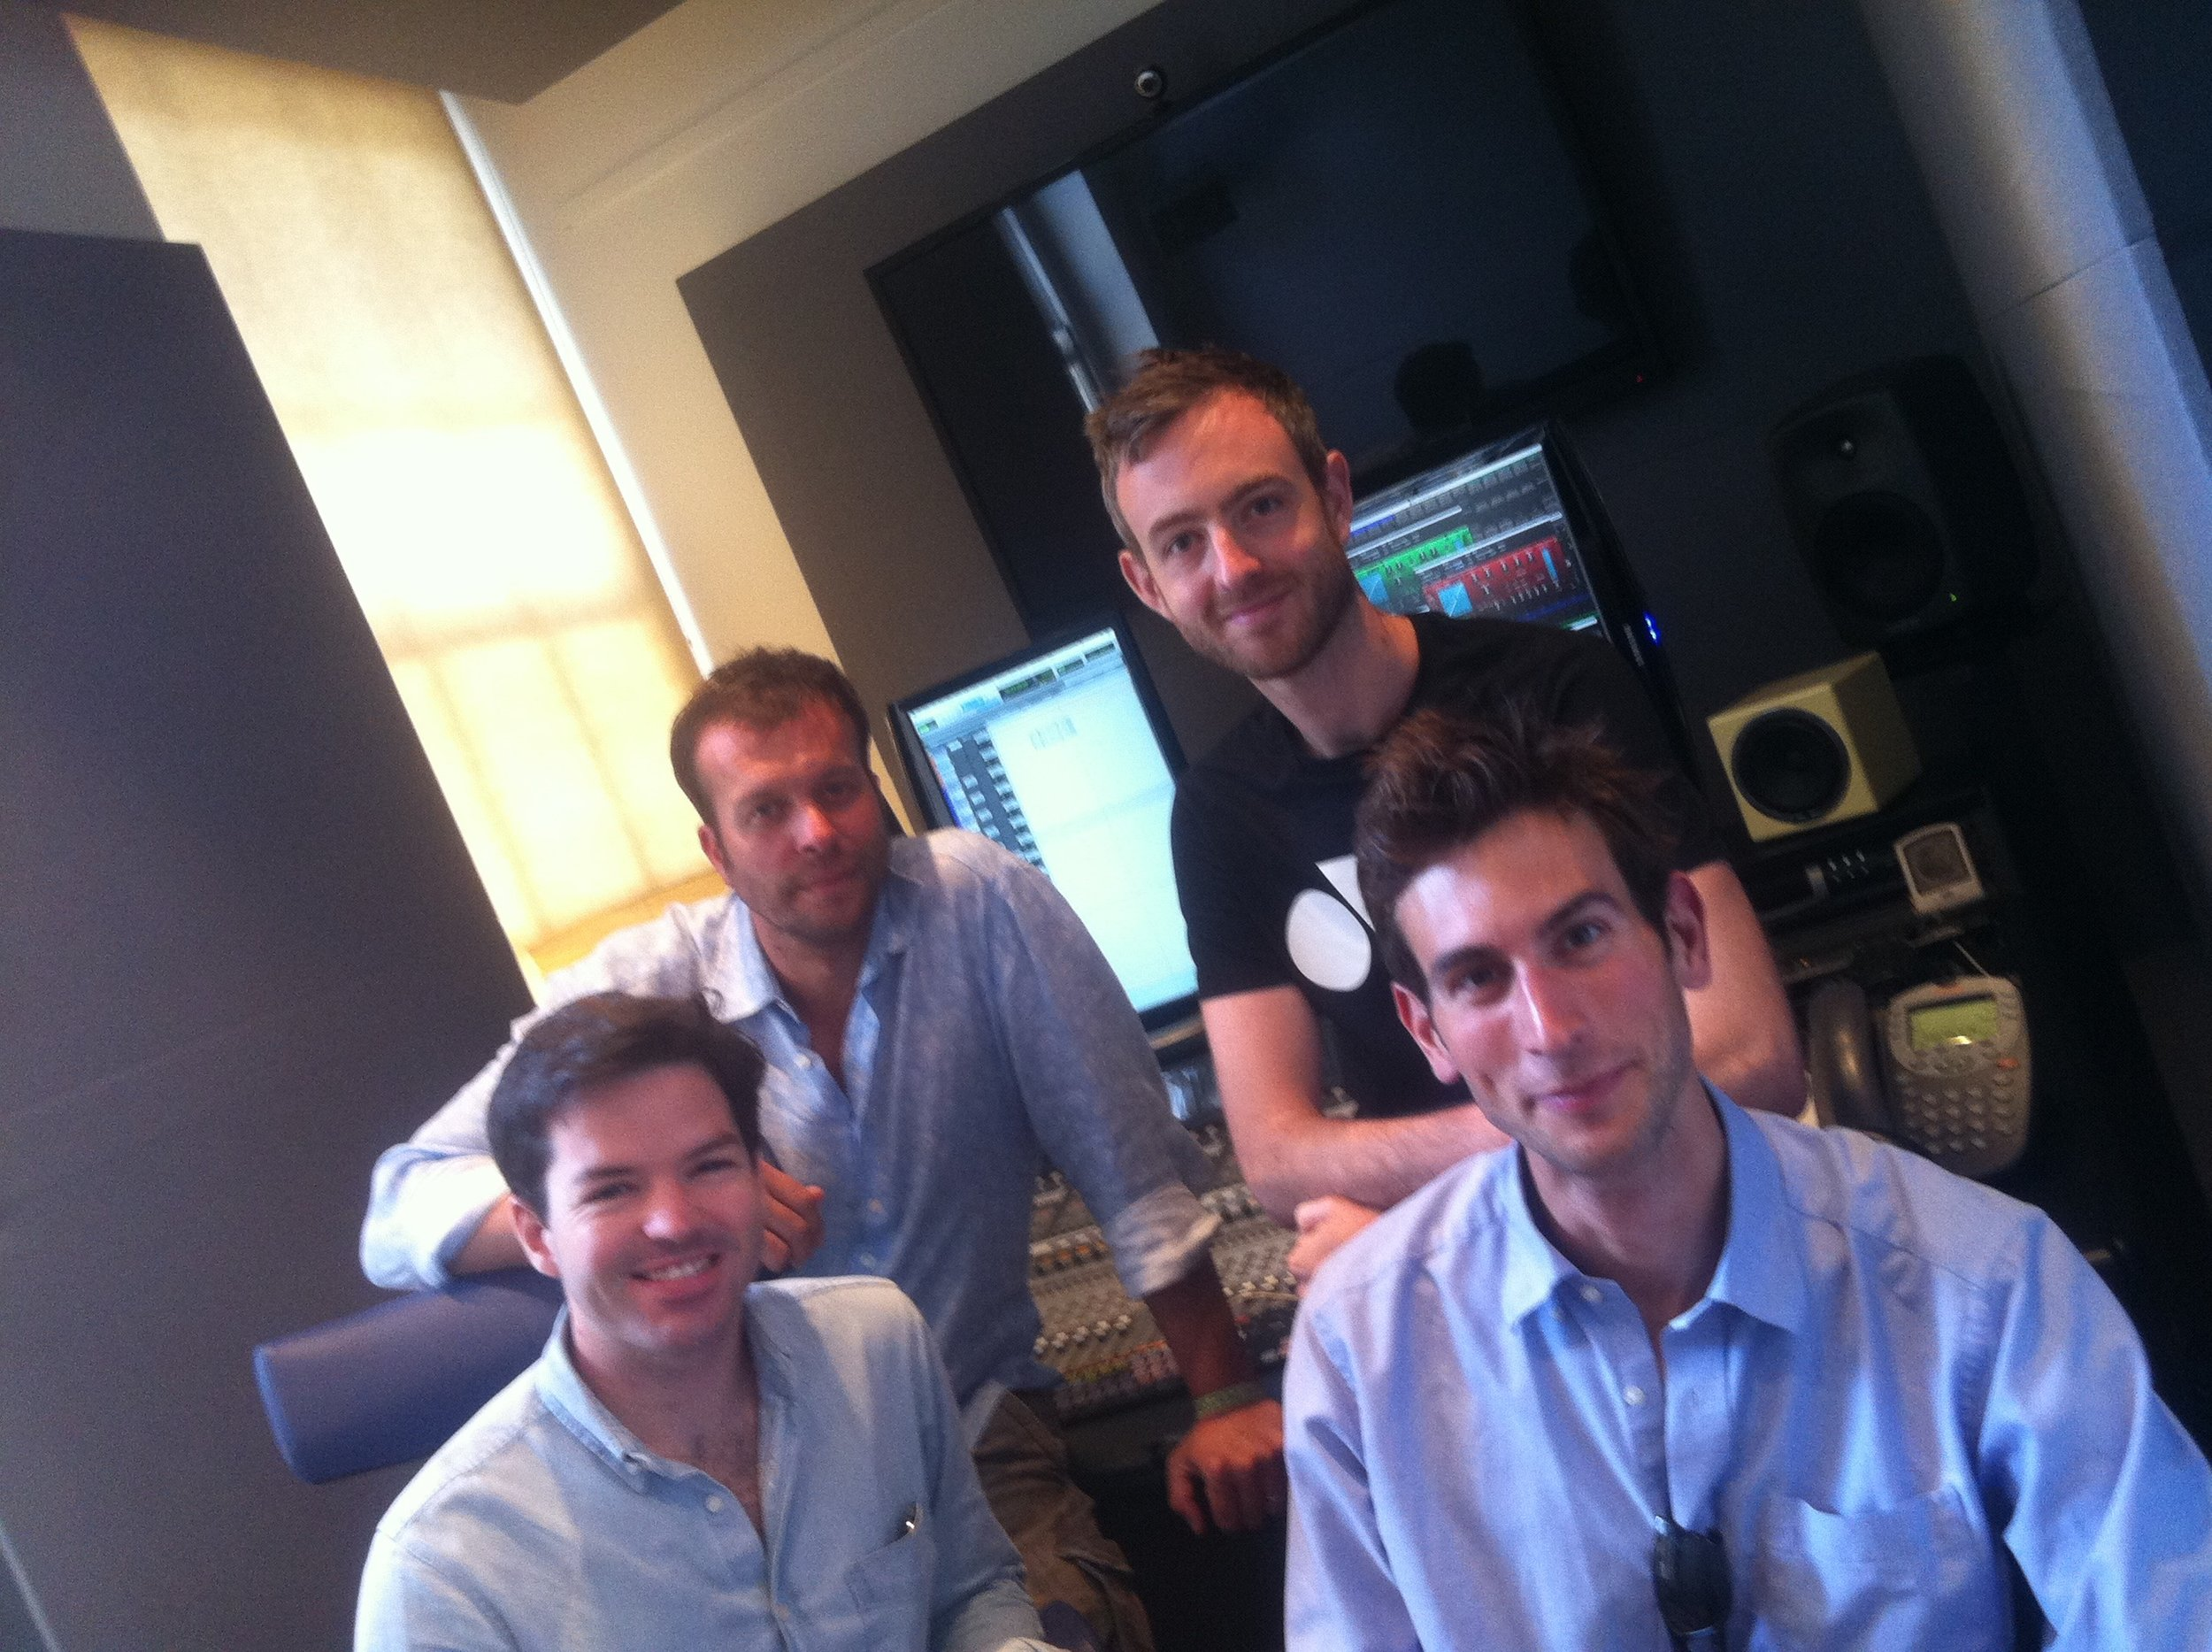 Harry Otto Brunjes, John Schwab & Thom Paisley, with James Edenborough (front right) recording Melaku Child Genius